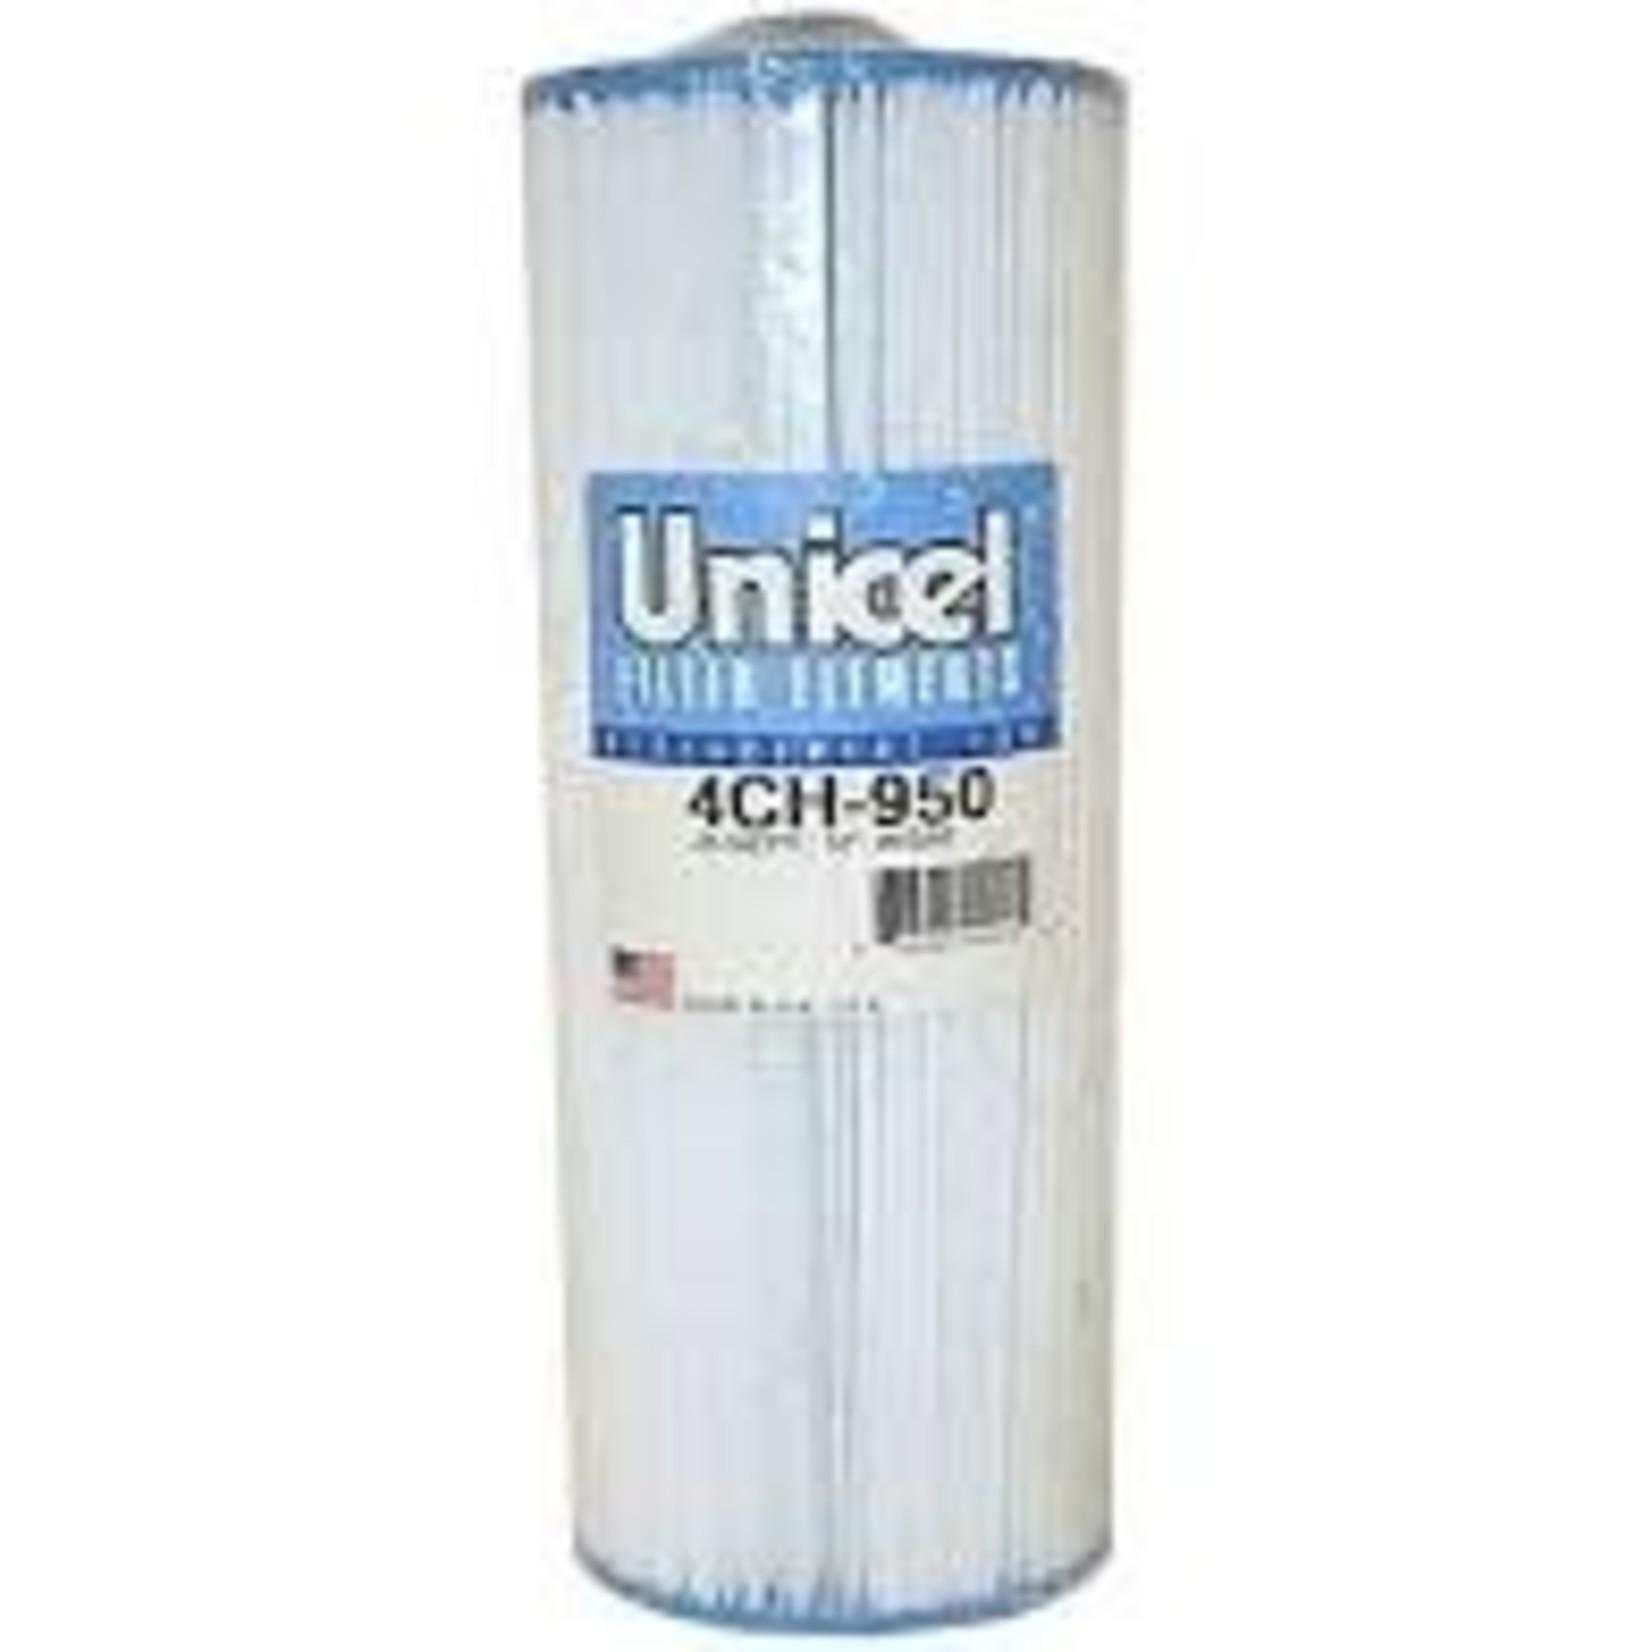 Unicel CARTRIDGE SPA 4CH-950